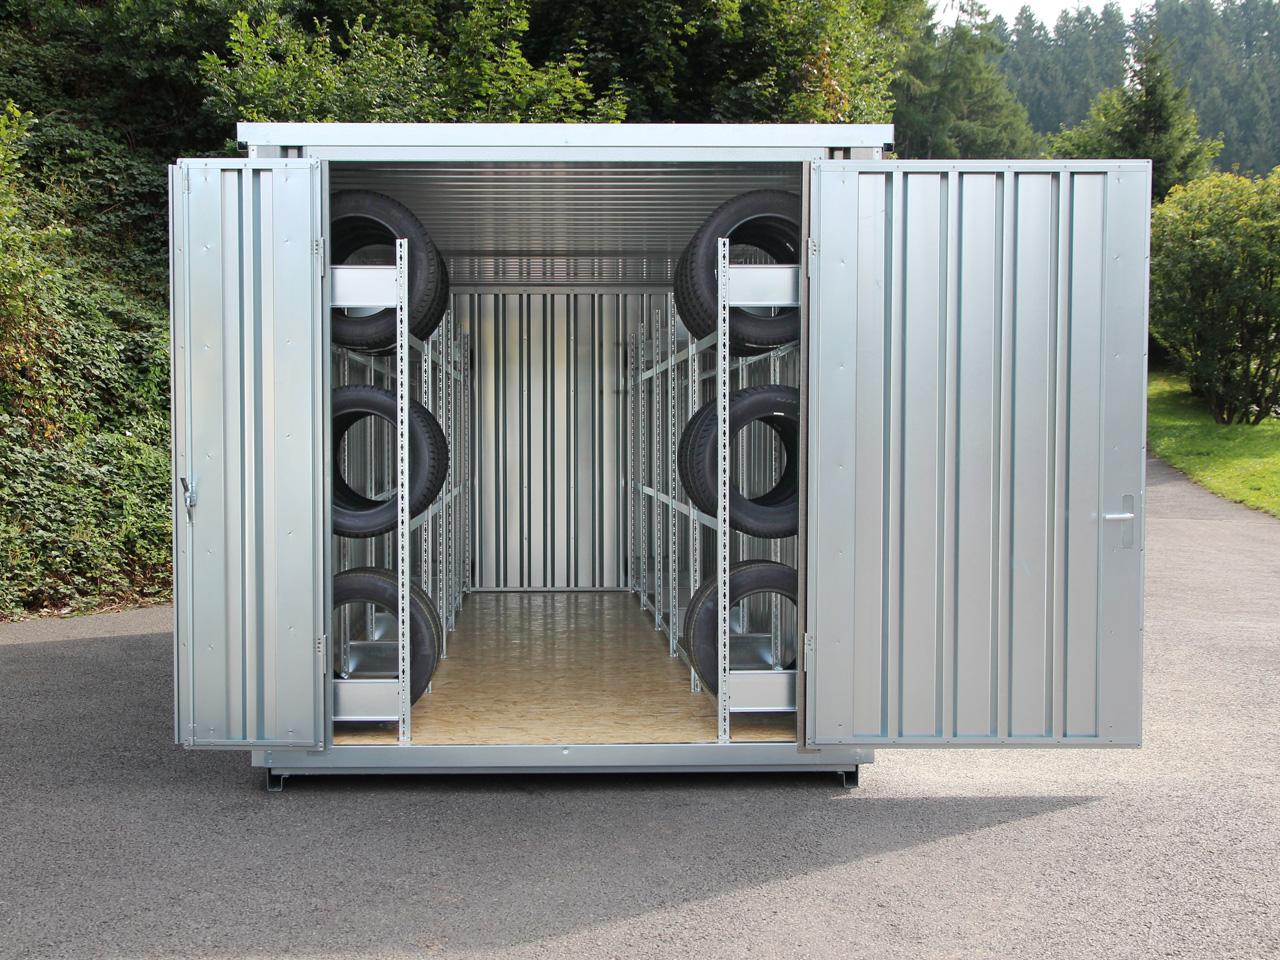 1251620_FLADAFI-Reifencontainer-1600-XXL_R1_RGB_0240_sl.jpg